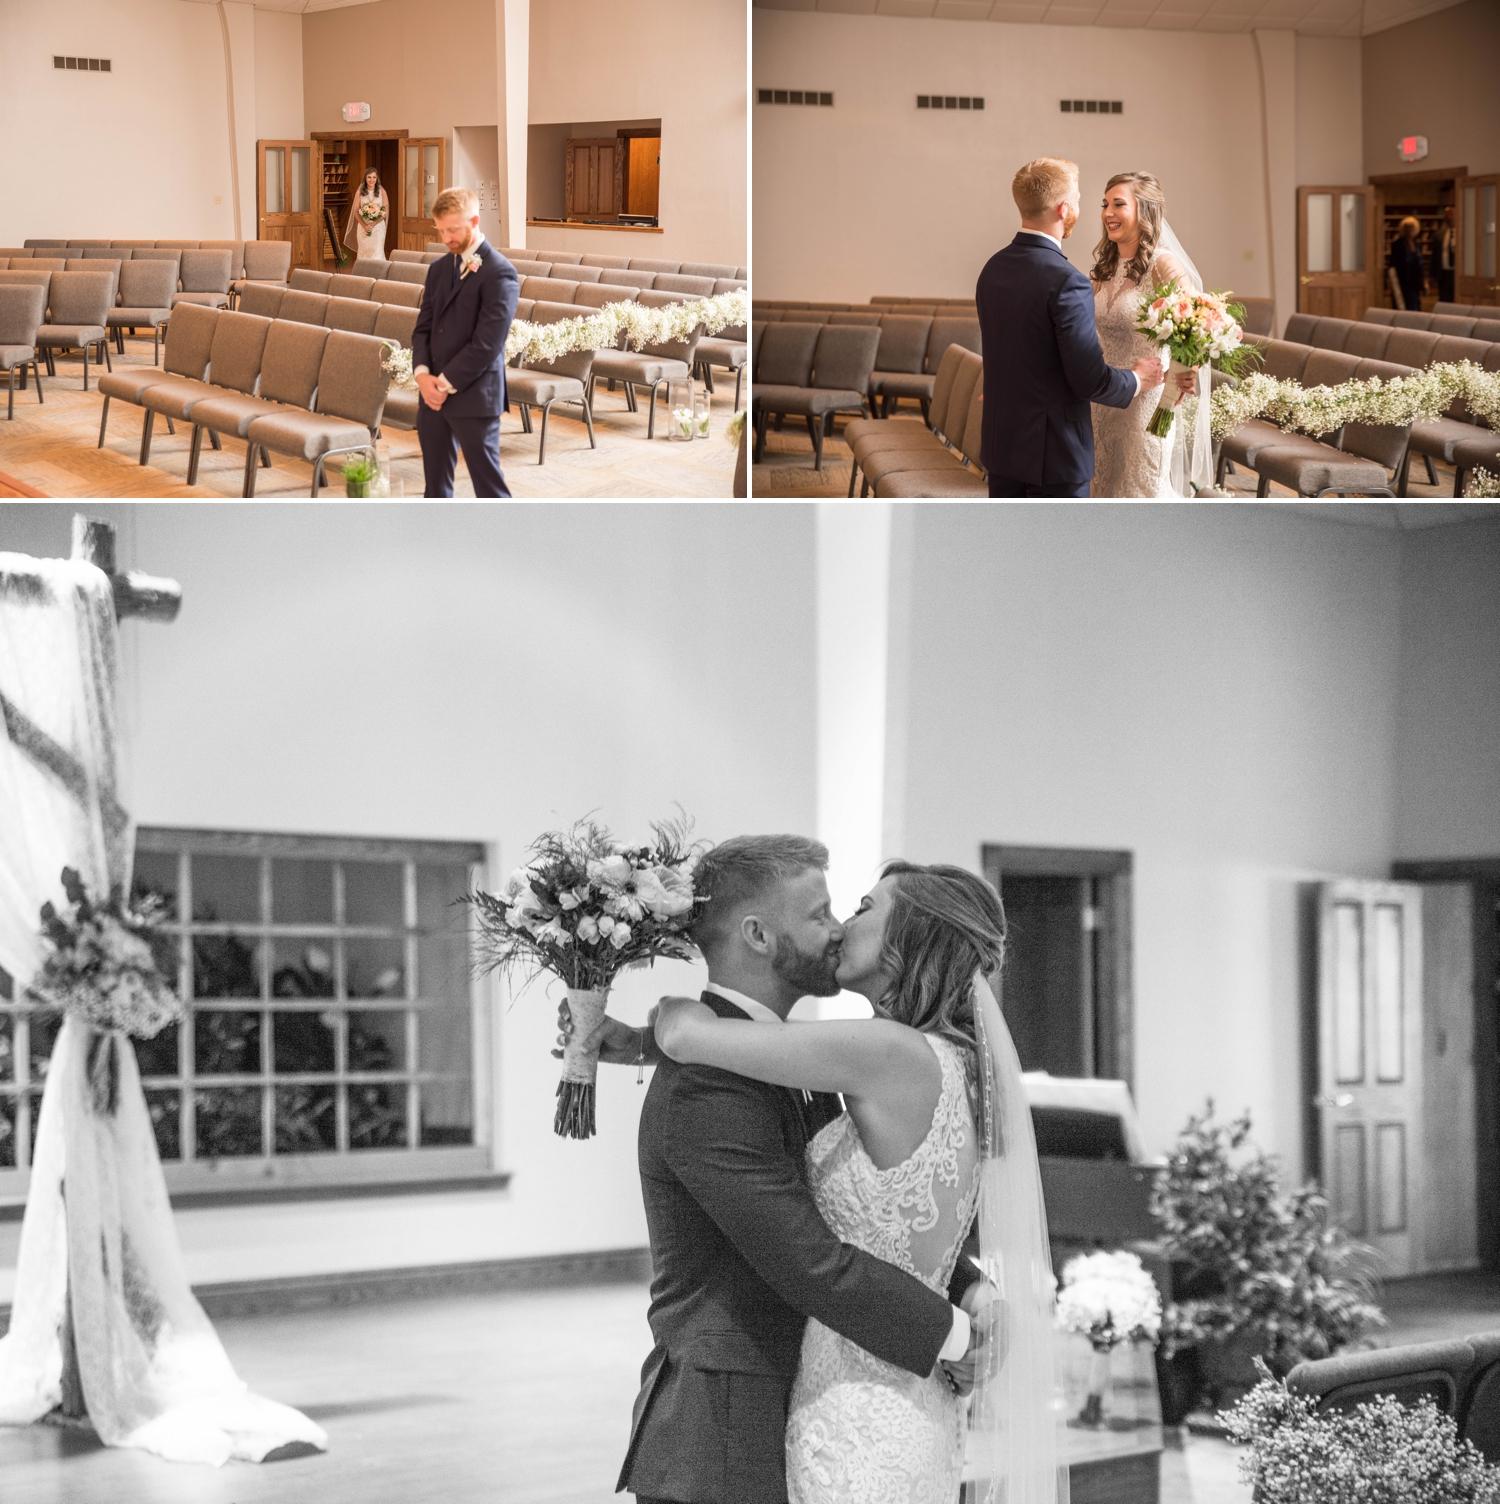 BryansCornerbalkooklahomawedding 2.jpg